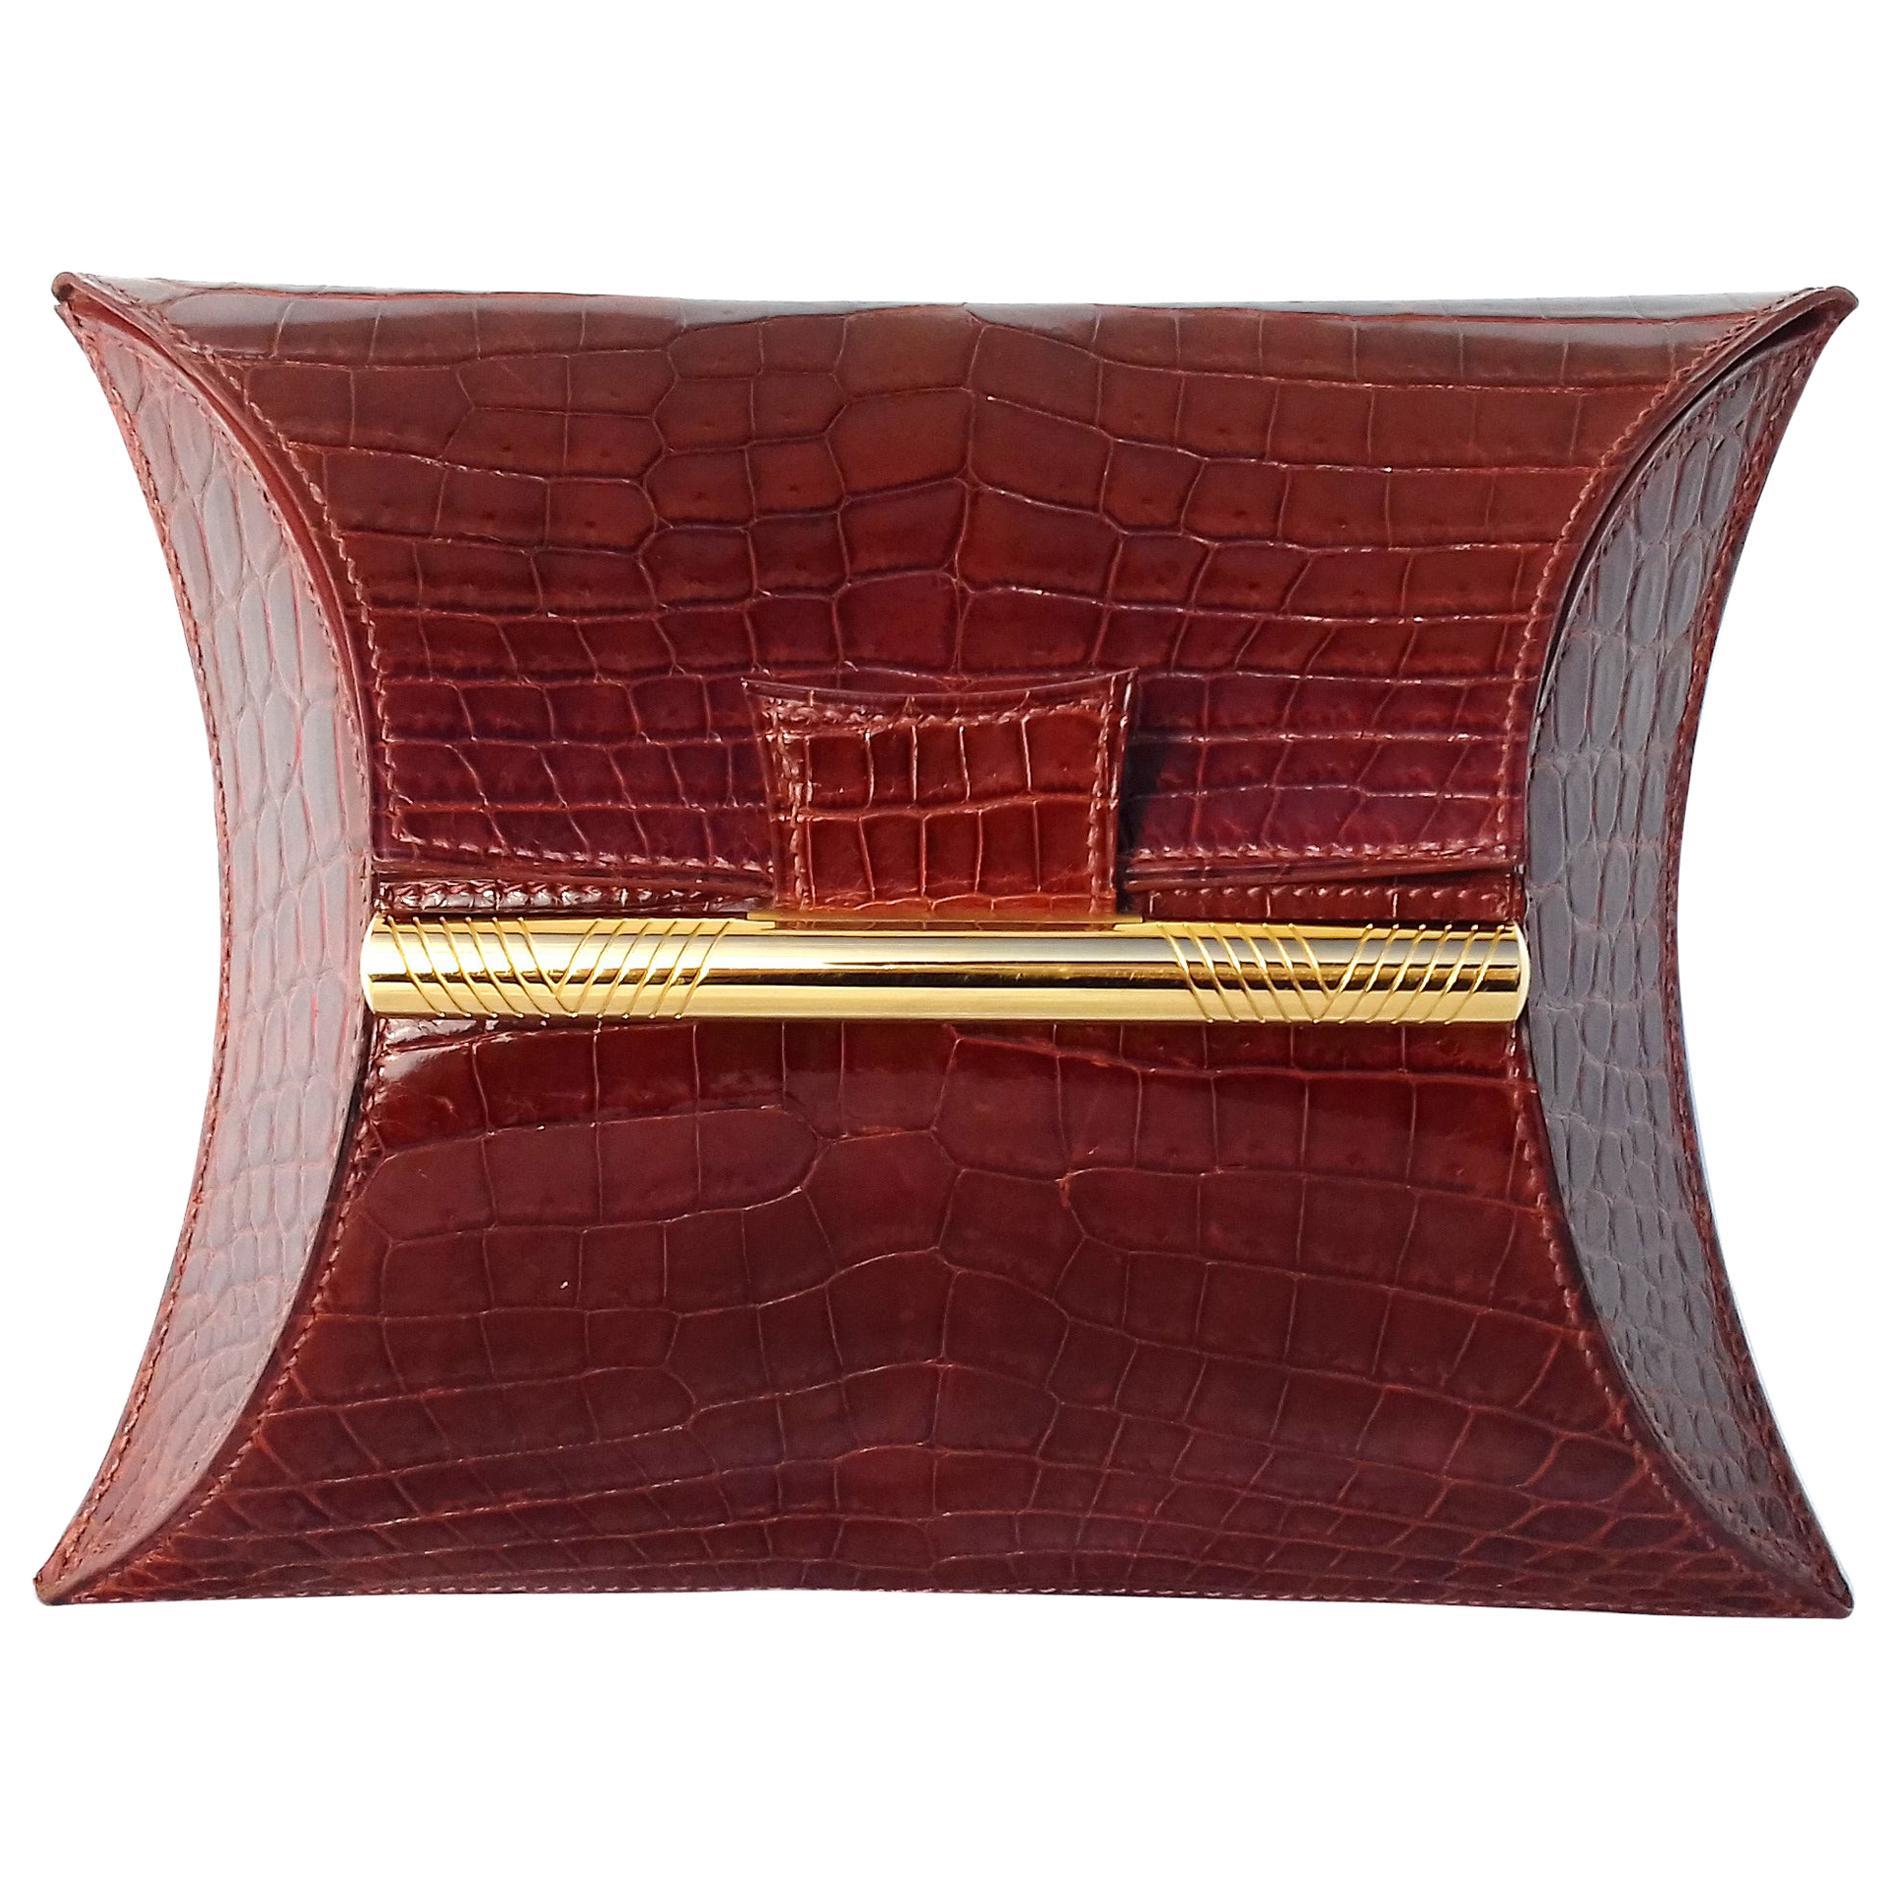 Exceptional Hermès Vintage Clutch Handbag Minaudiere Shiny Crocodile Ghw RARE